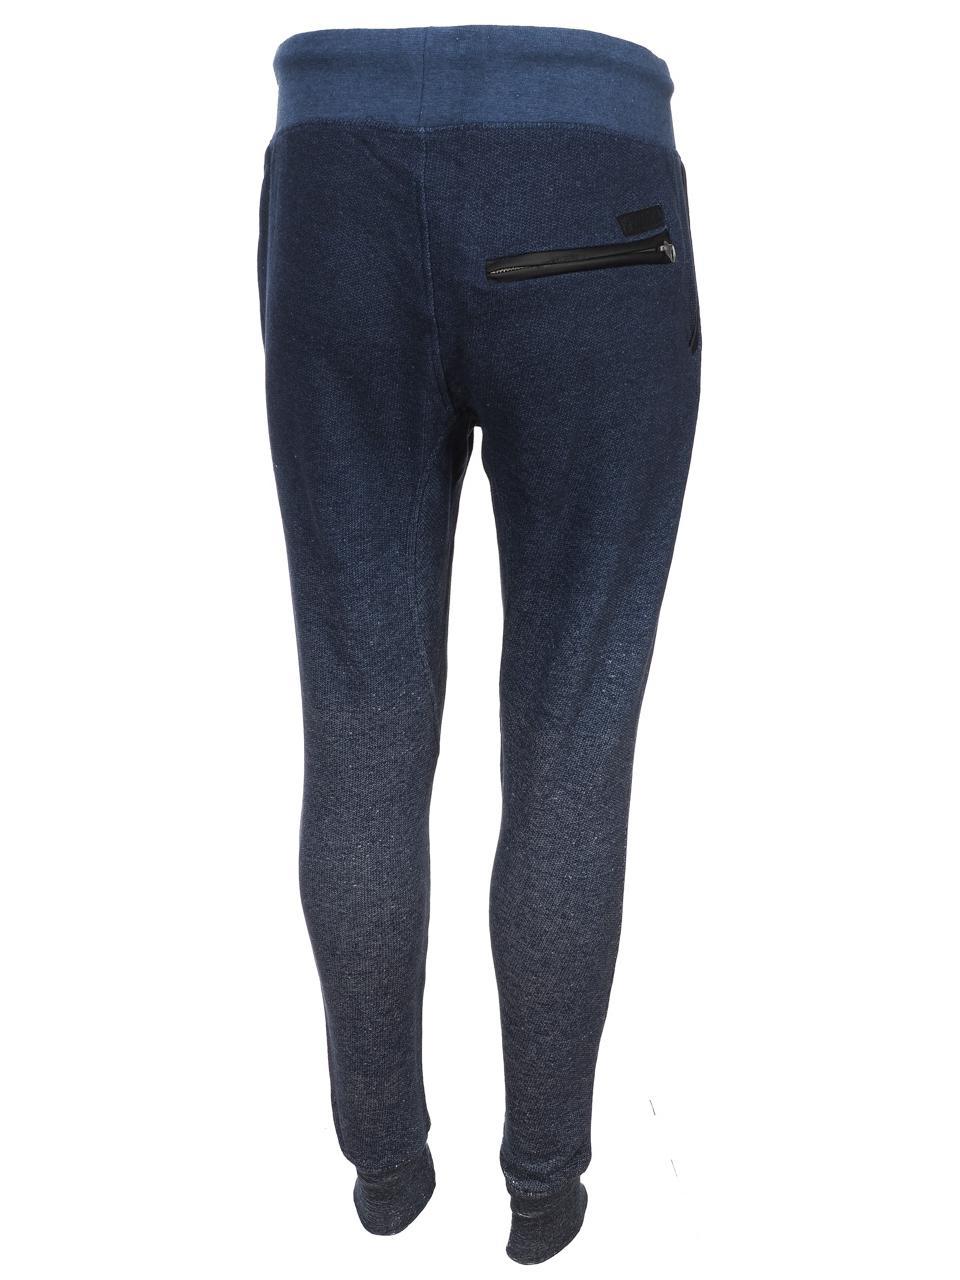 Pantalon-de-survetement-Biaggio-Krodil-navy-pant-jogg-Bleu-57532-Neuf miniature 5